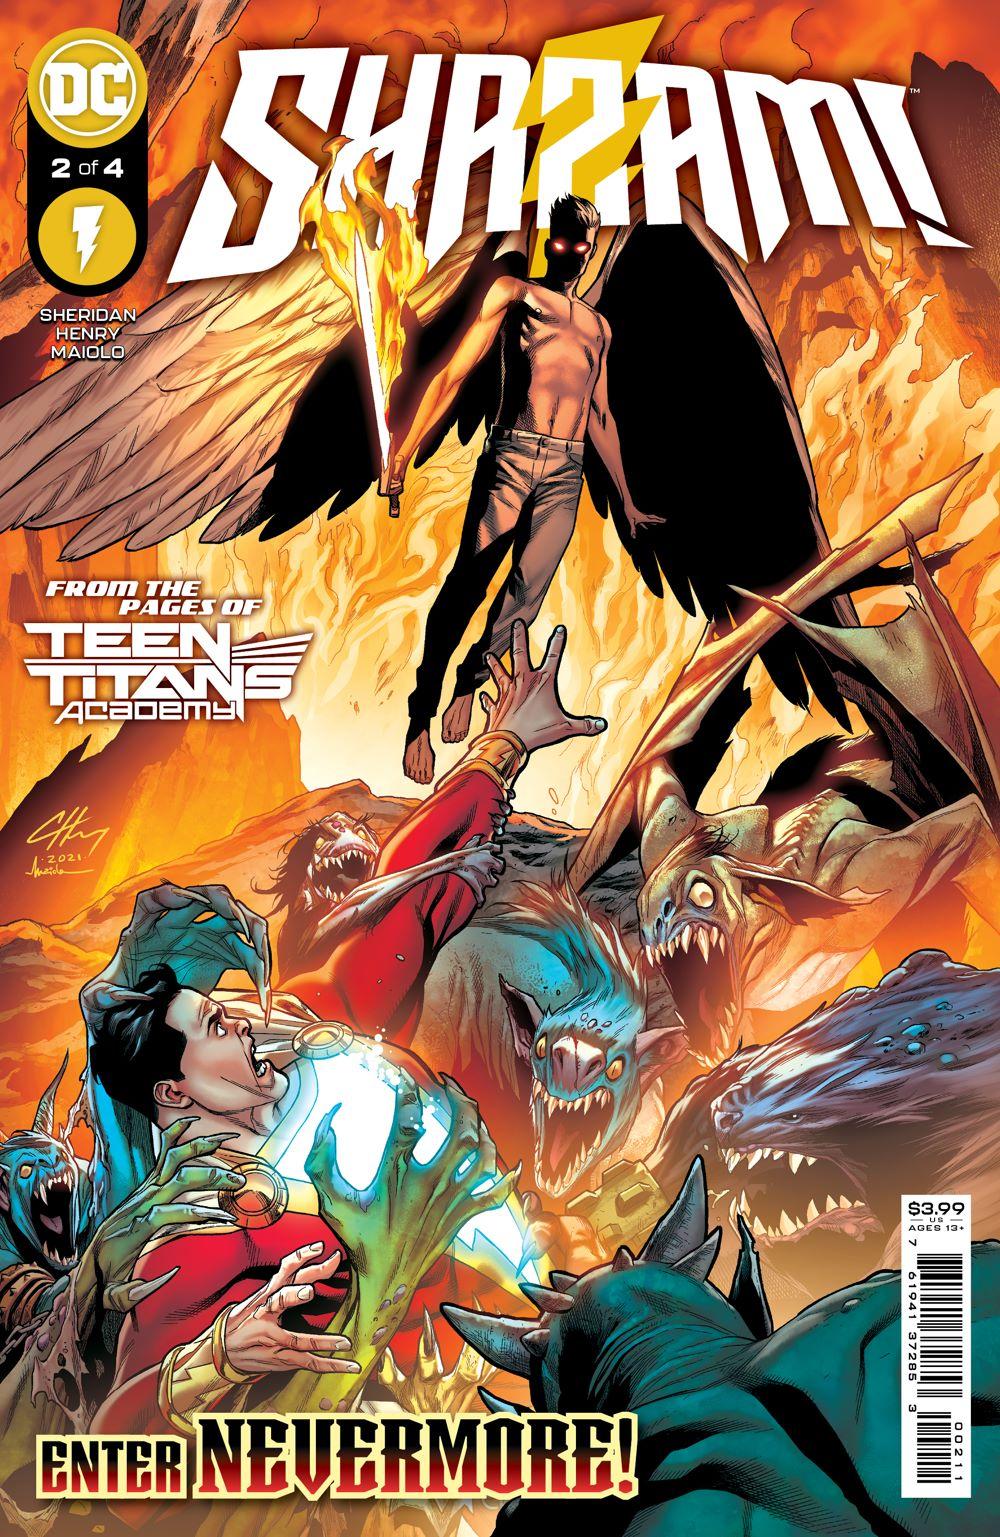 SHAZAM_Cv2 DC Comics August 2021 Solicitations